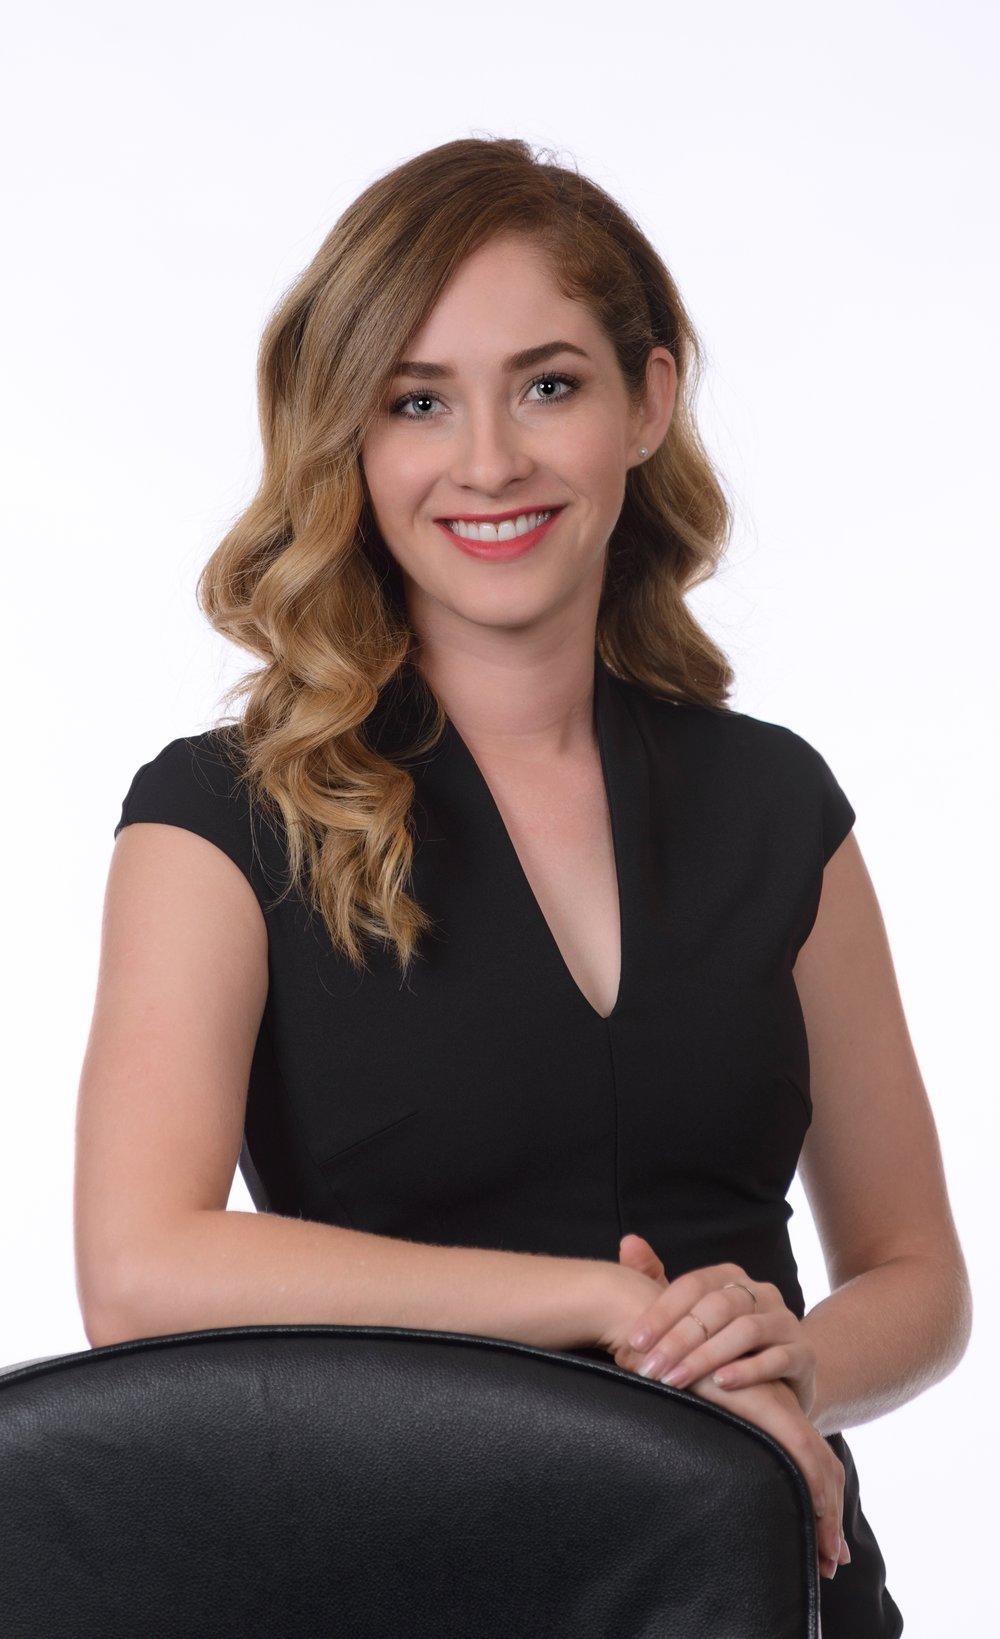 Ana Lucia Garro